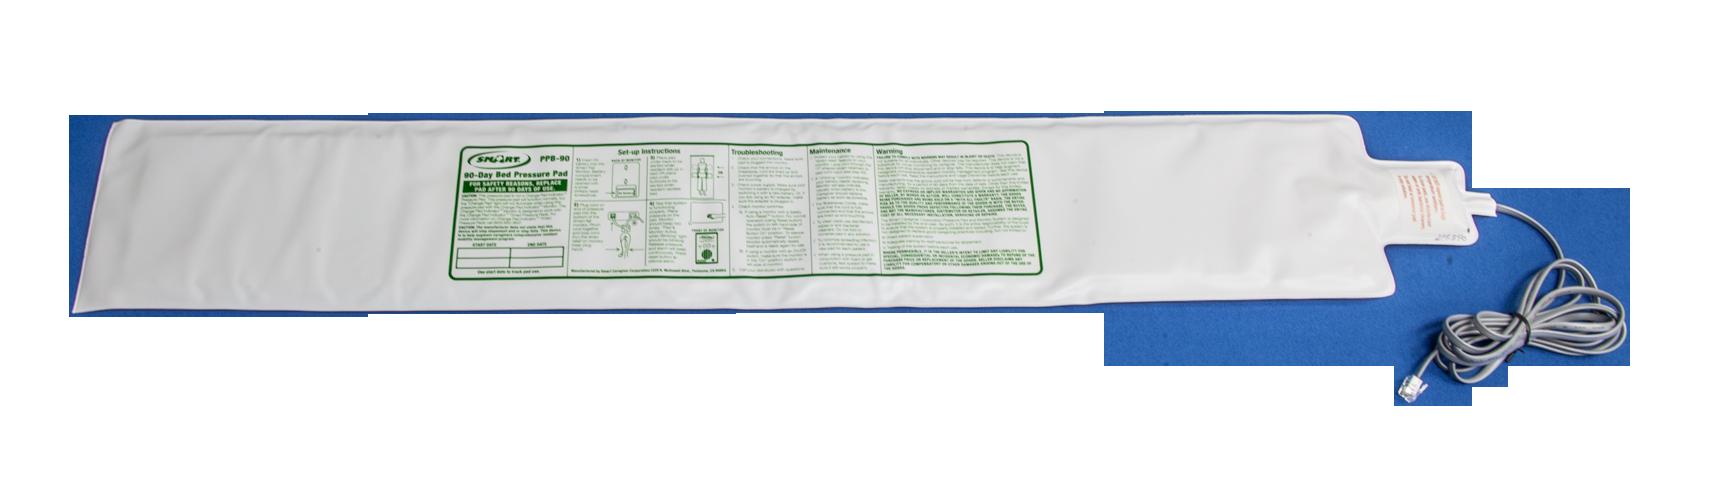 Smart Caregiver  PPB-90 Bed Pressure Pad 5 x 30 Inch - Straight Cord